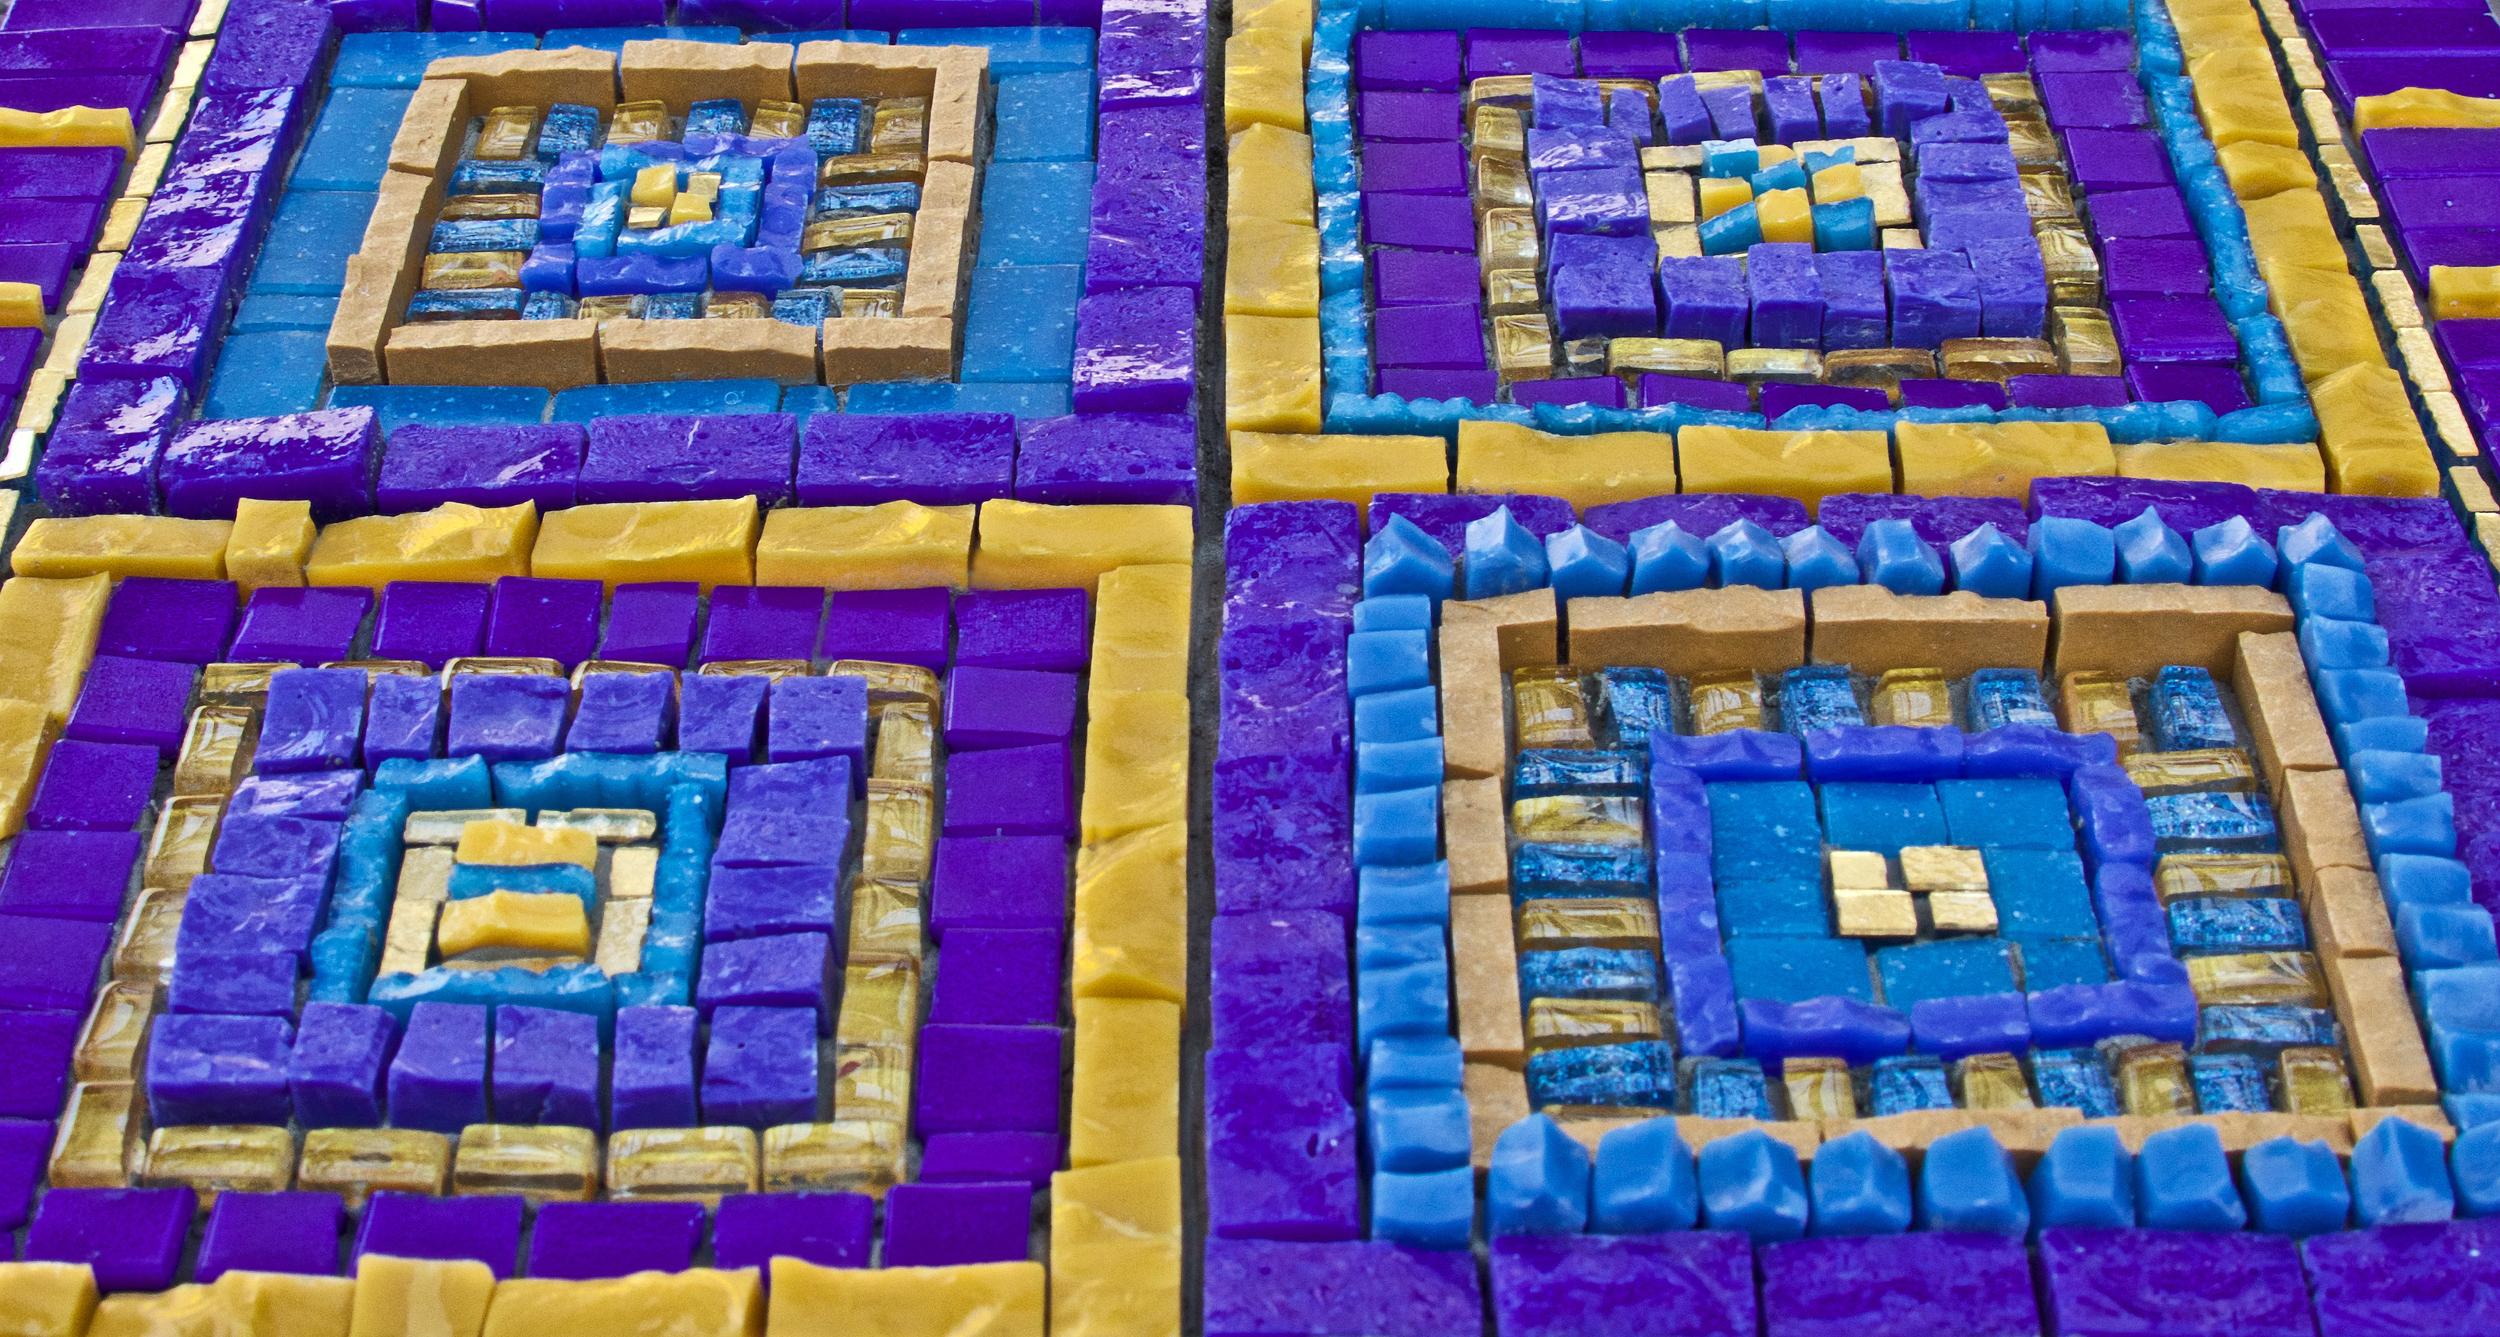 "Beginner's Mind #3  ,detail. 10"" x 8"" | 25cm x 20cm. Smalti, mosaic gold, vitreous, other glass"